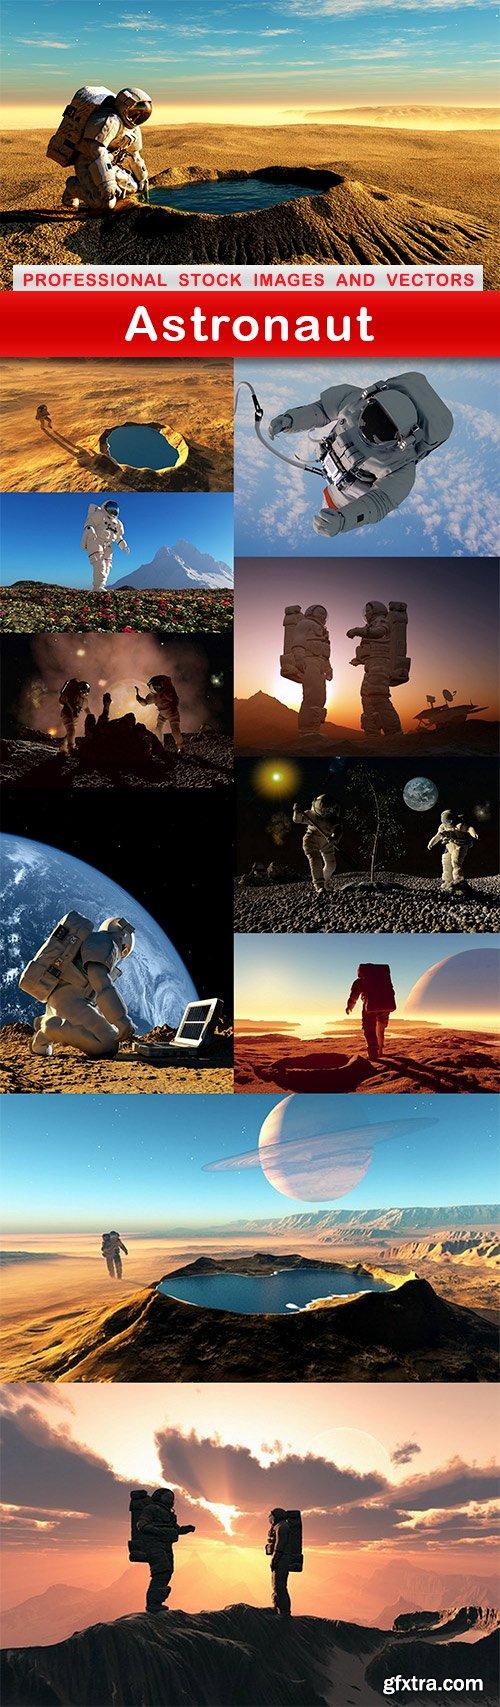 Astronaut - 11 UHQ JPEG